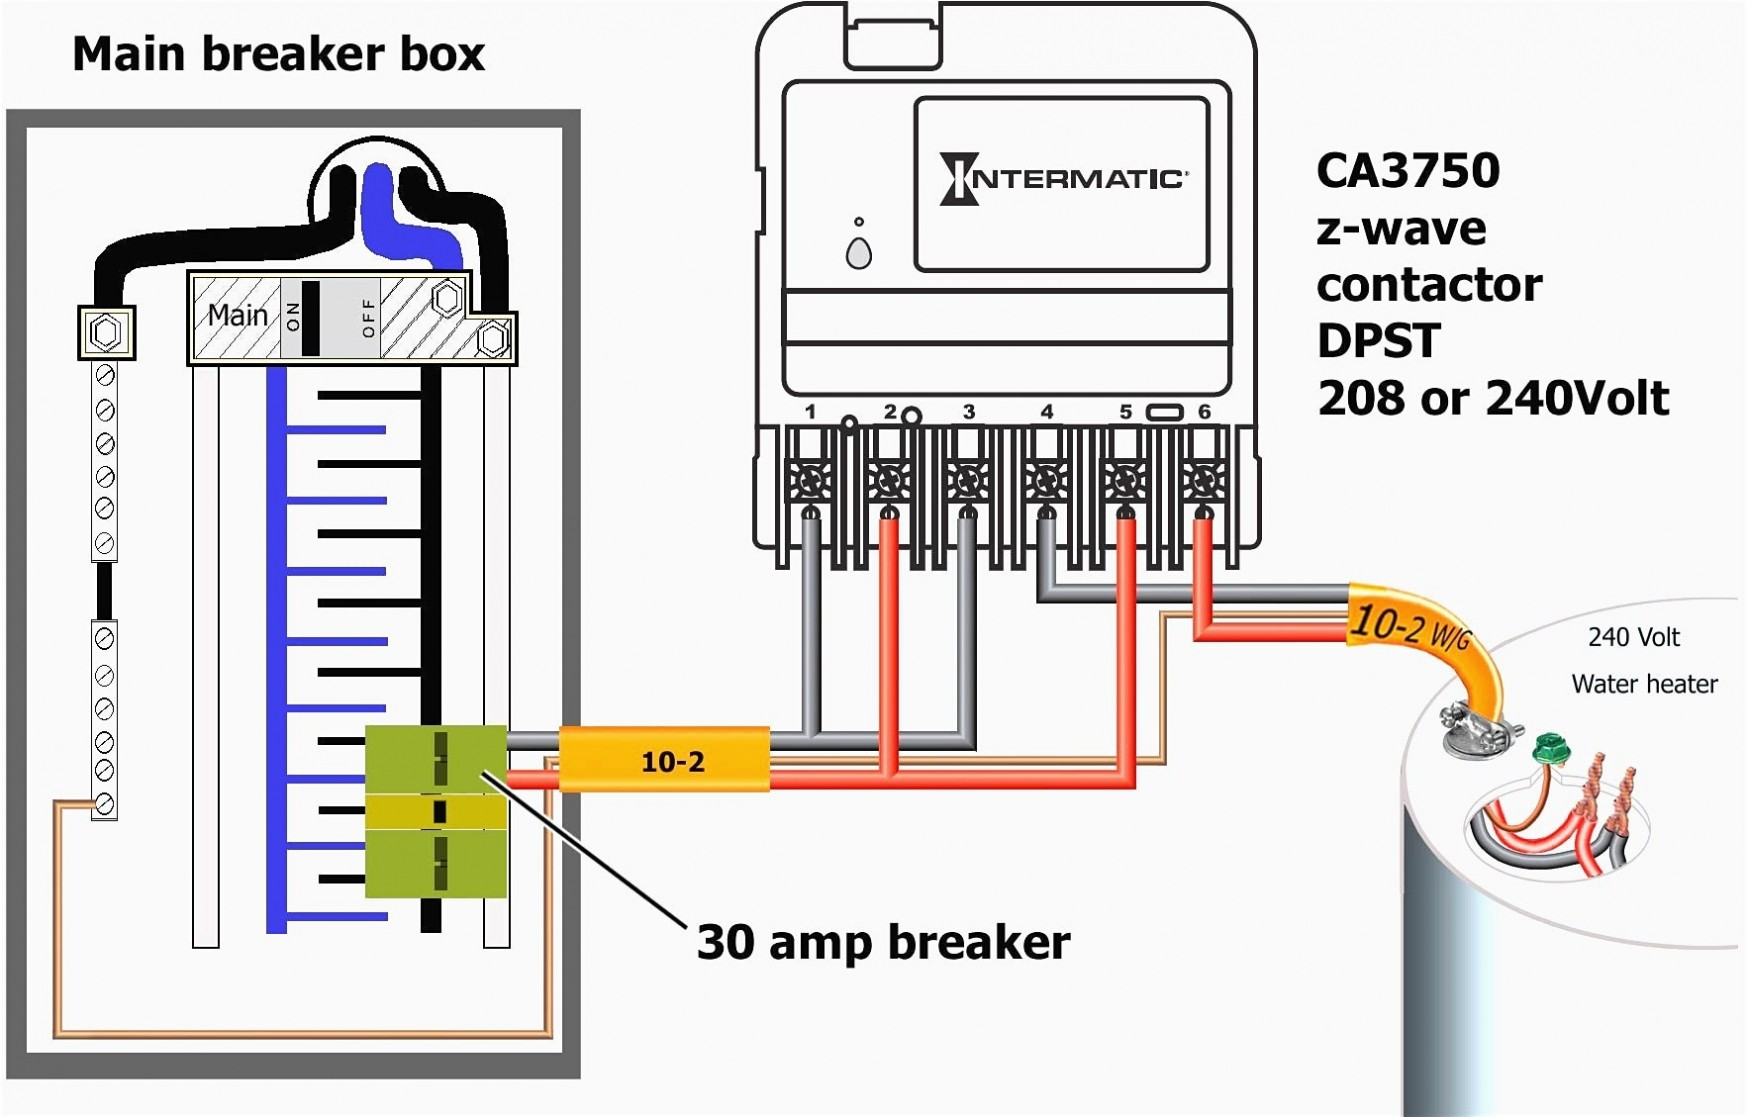 220 Breaker Box Wiring Diagram Awesome 220 Breaker Box Wiring Diagram Fresh Great 220 Volt Wiring